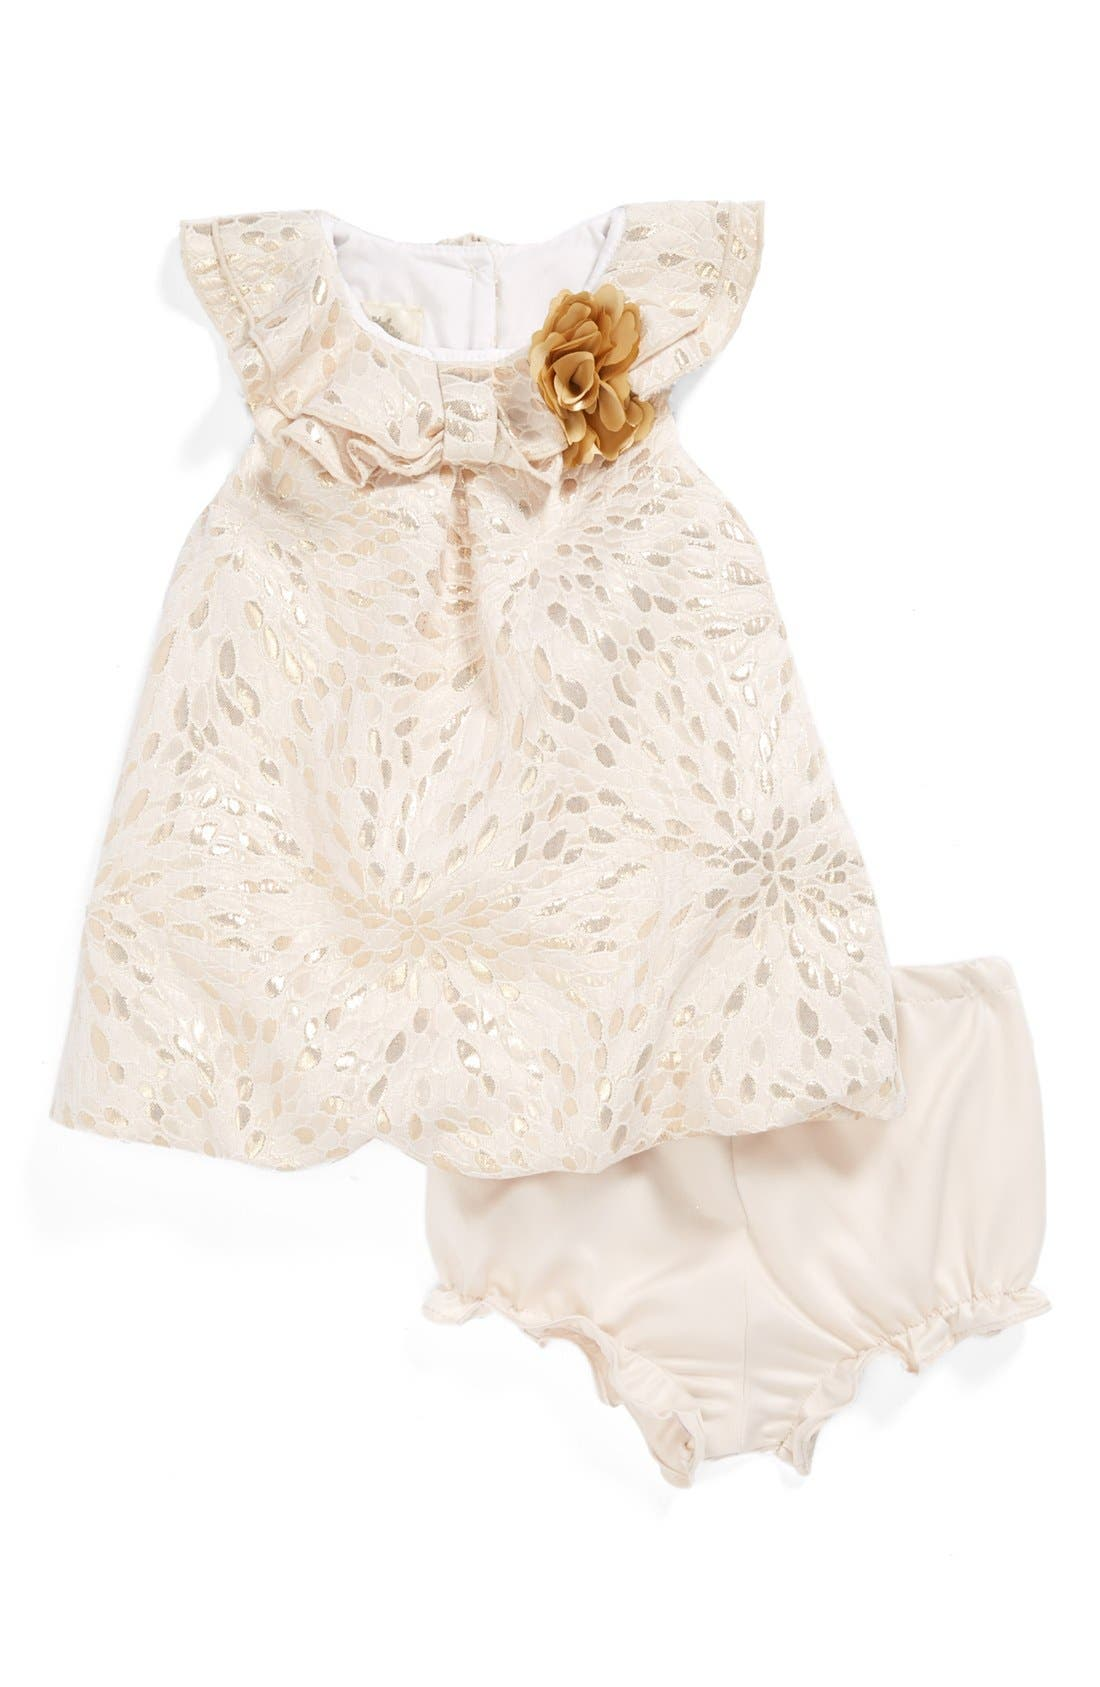 Main Image - Pippa & Julie Brocade Bubble Dress (Baby Girls)